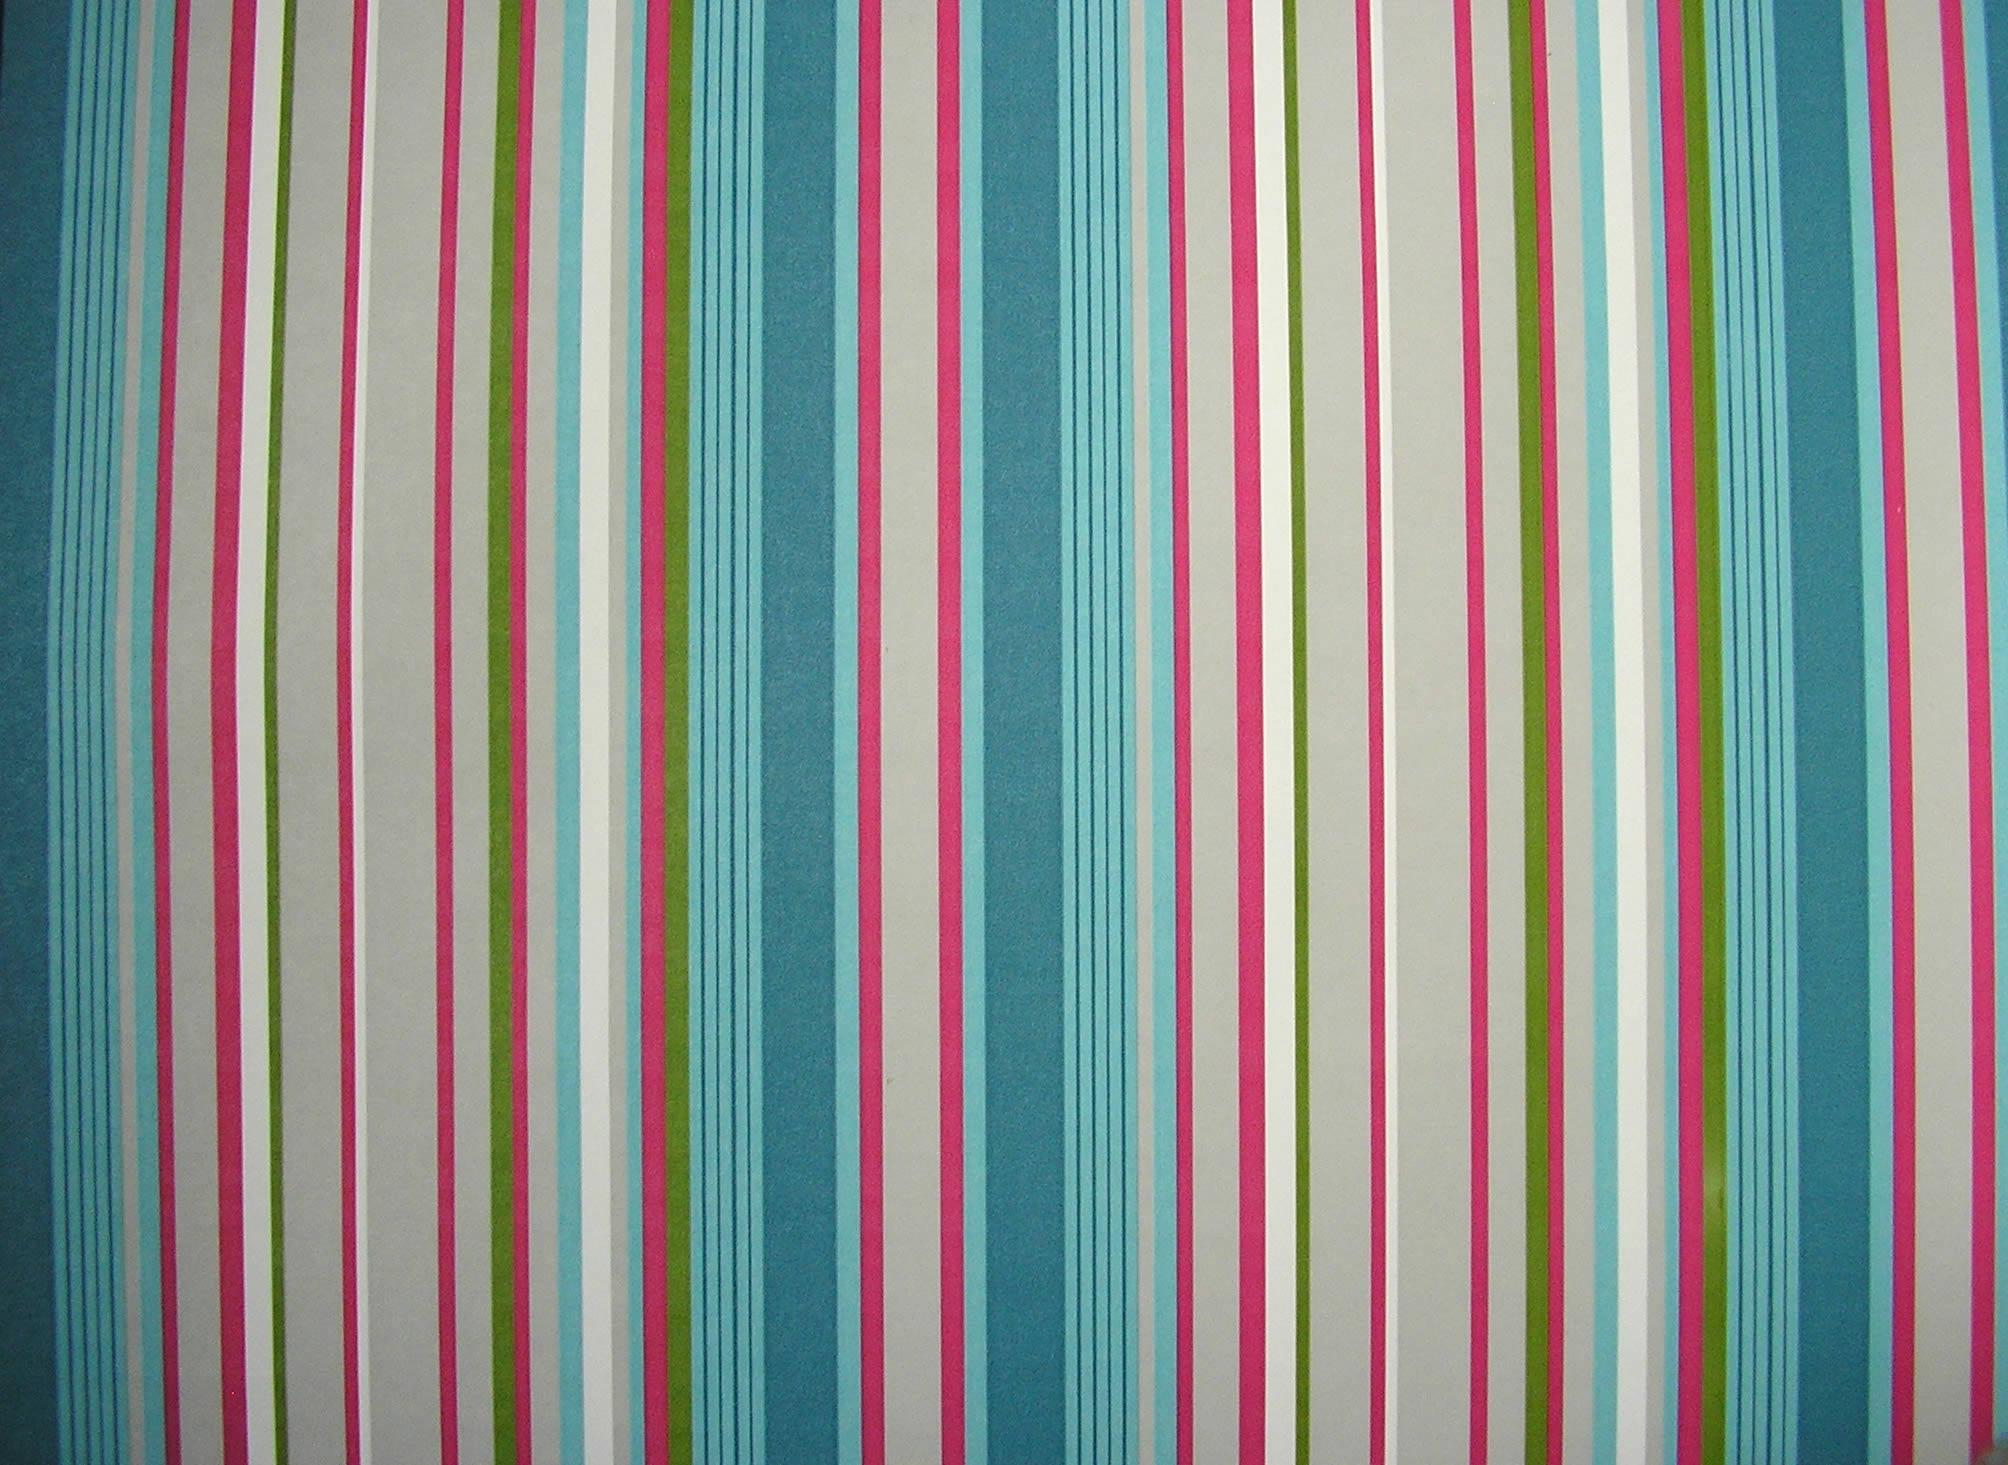 Blue Stripe Wallpaper: Petrol Blue Striped Wallpaper